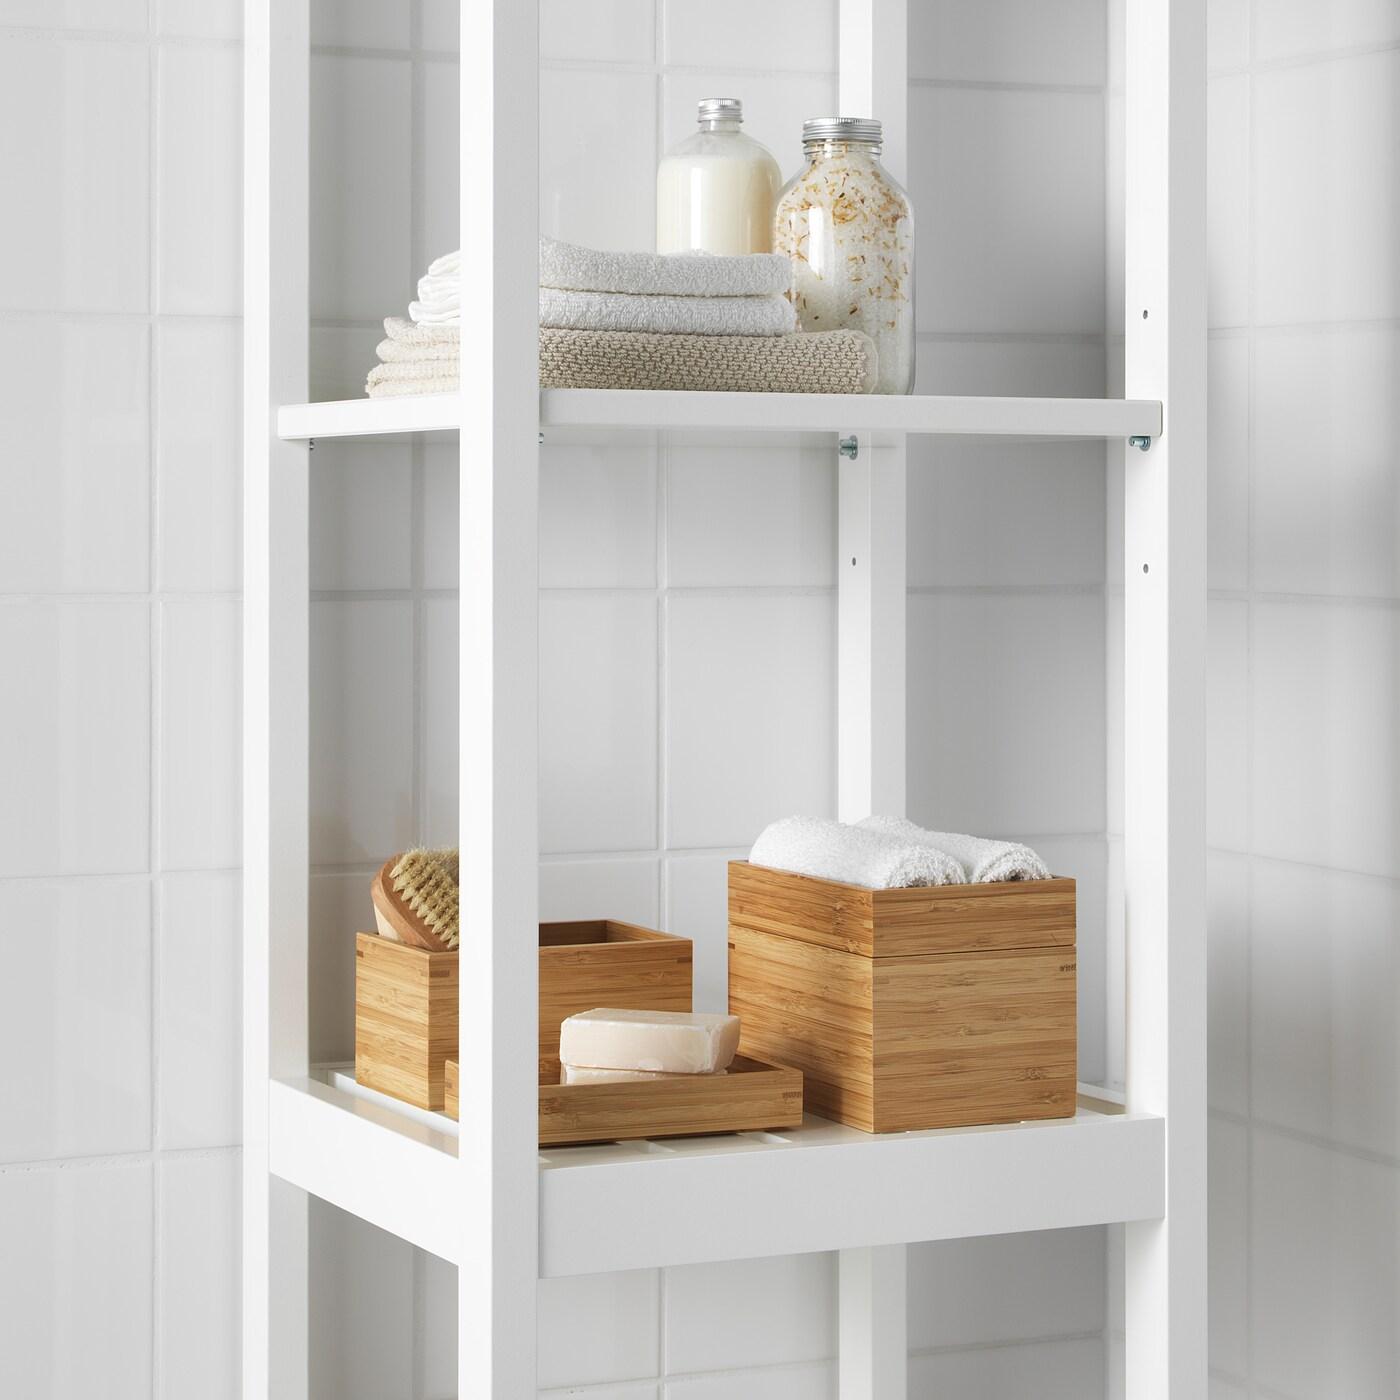 DRAGAN Juego de baño, 4 unidades bambú